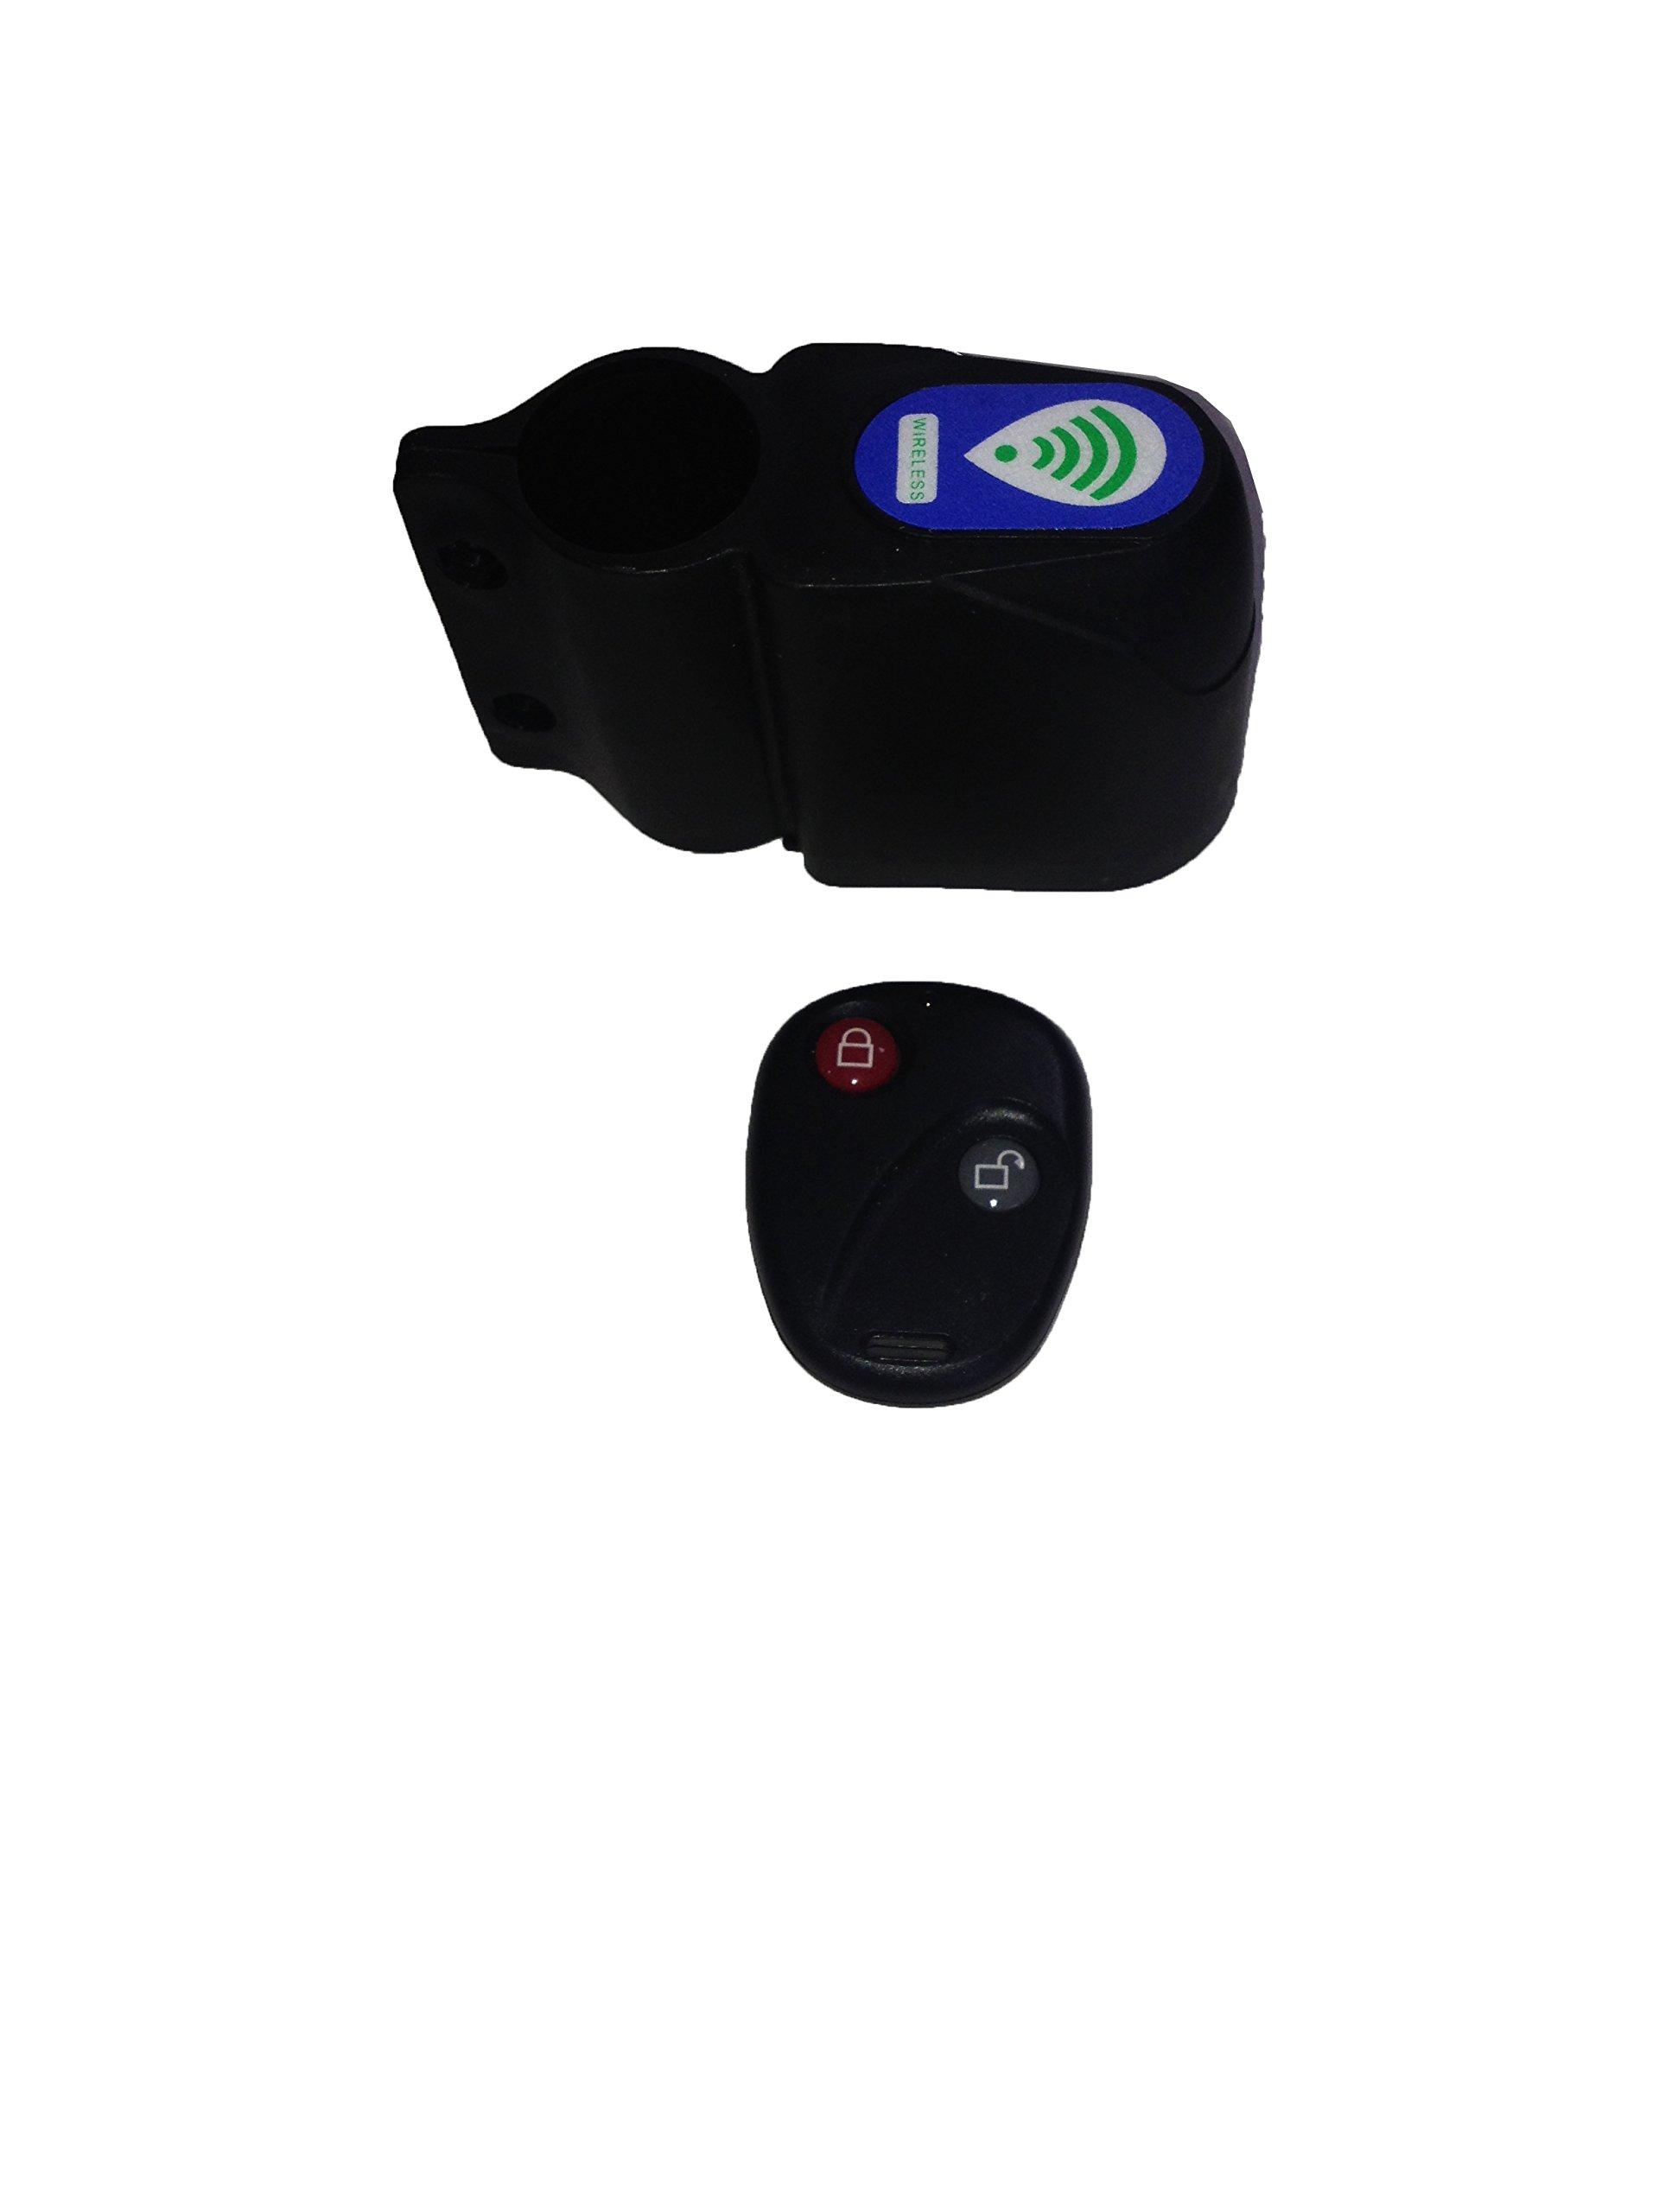 RMB Wireless Alarm